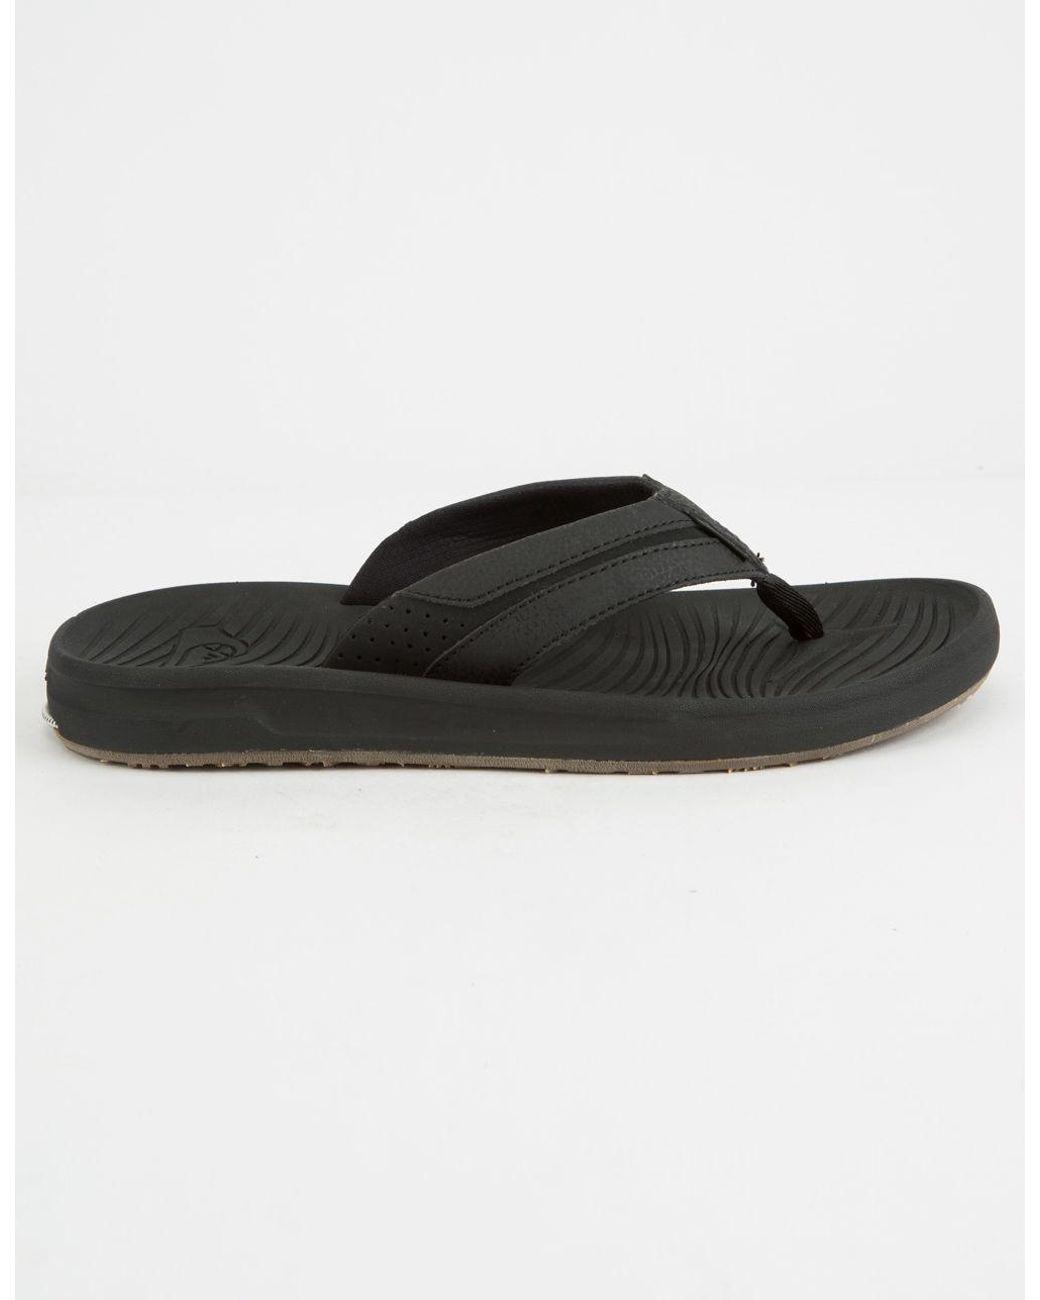 8325a5d51d79 Lyst - Quiksilver Travel Oasis Mens Sandals in Black for Men